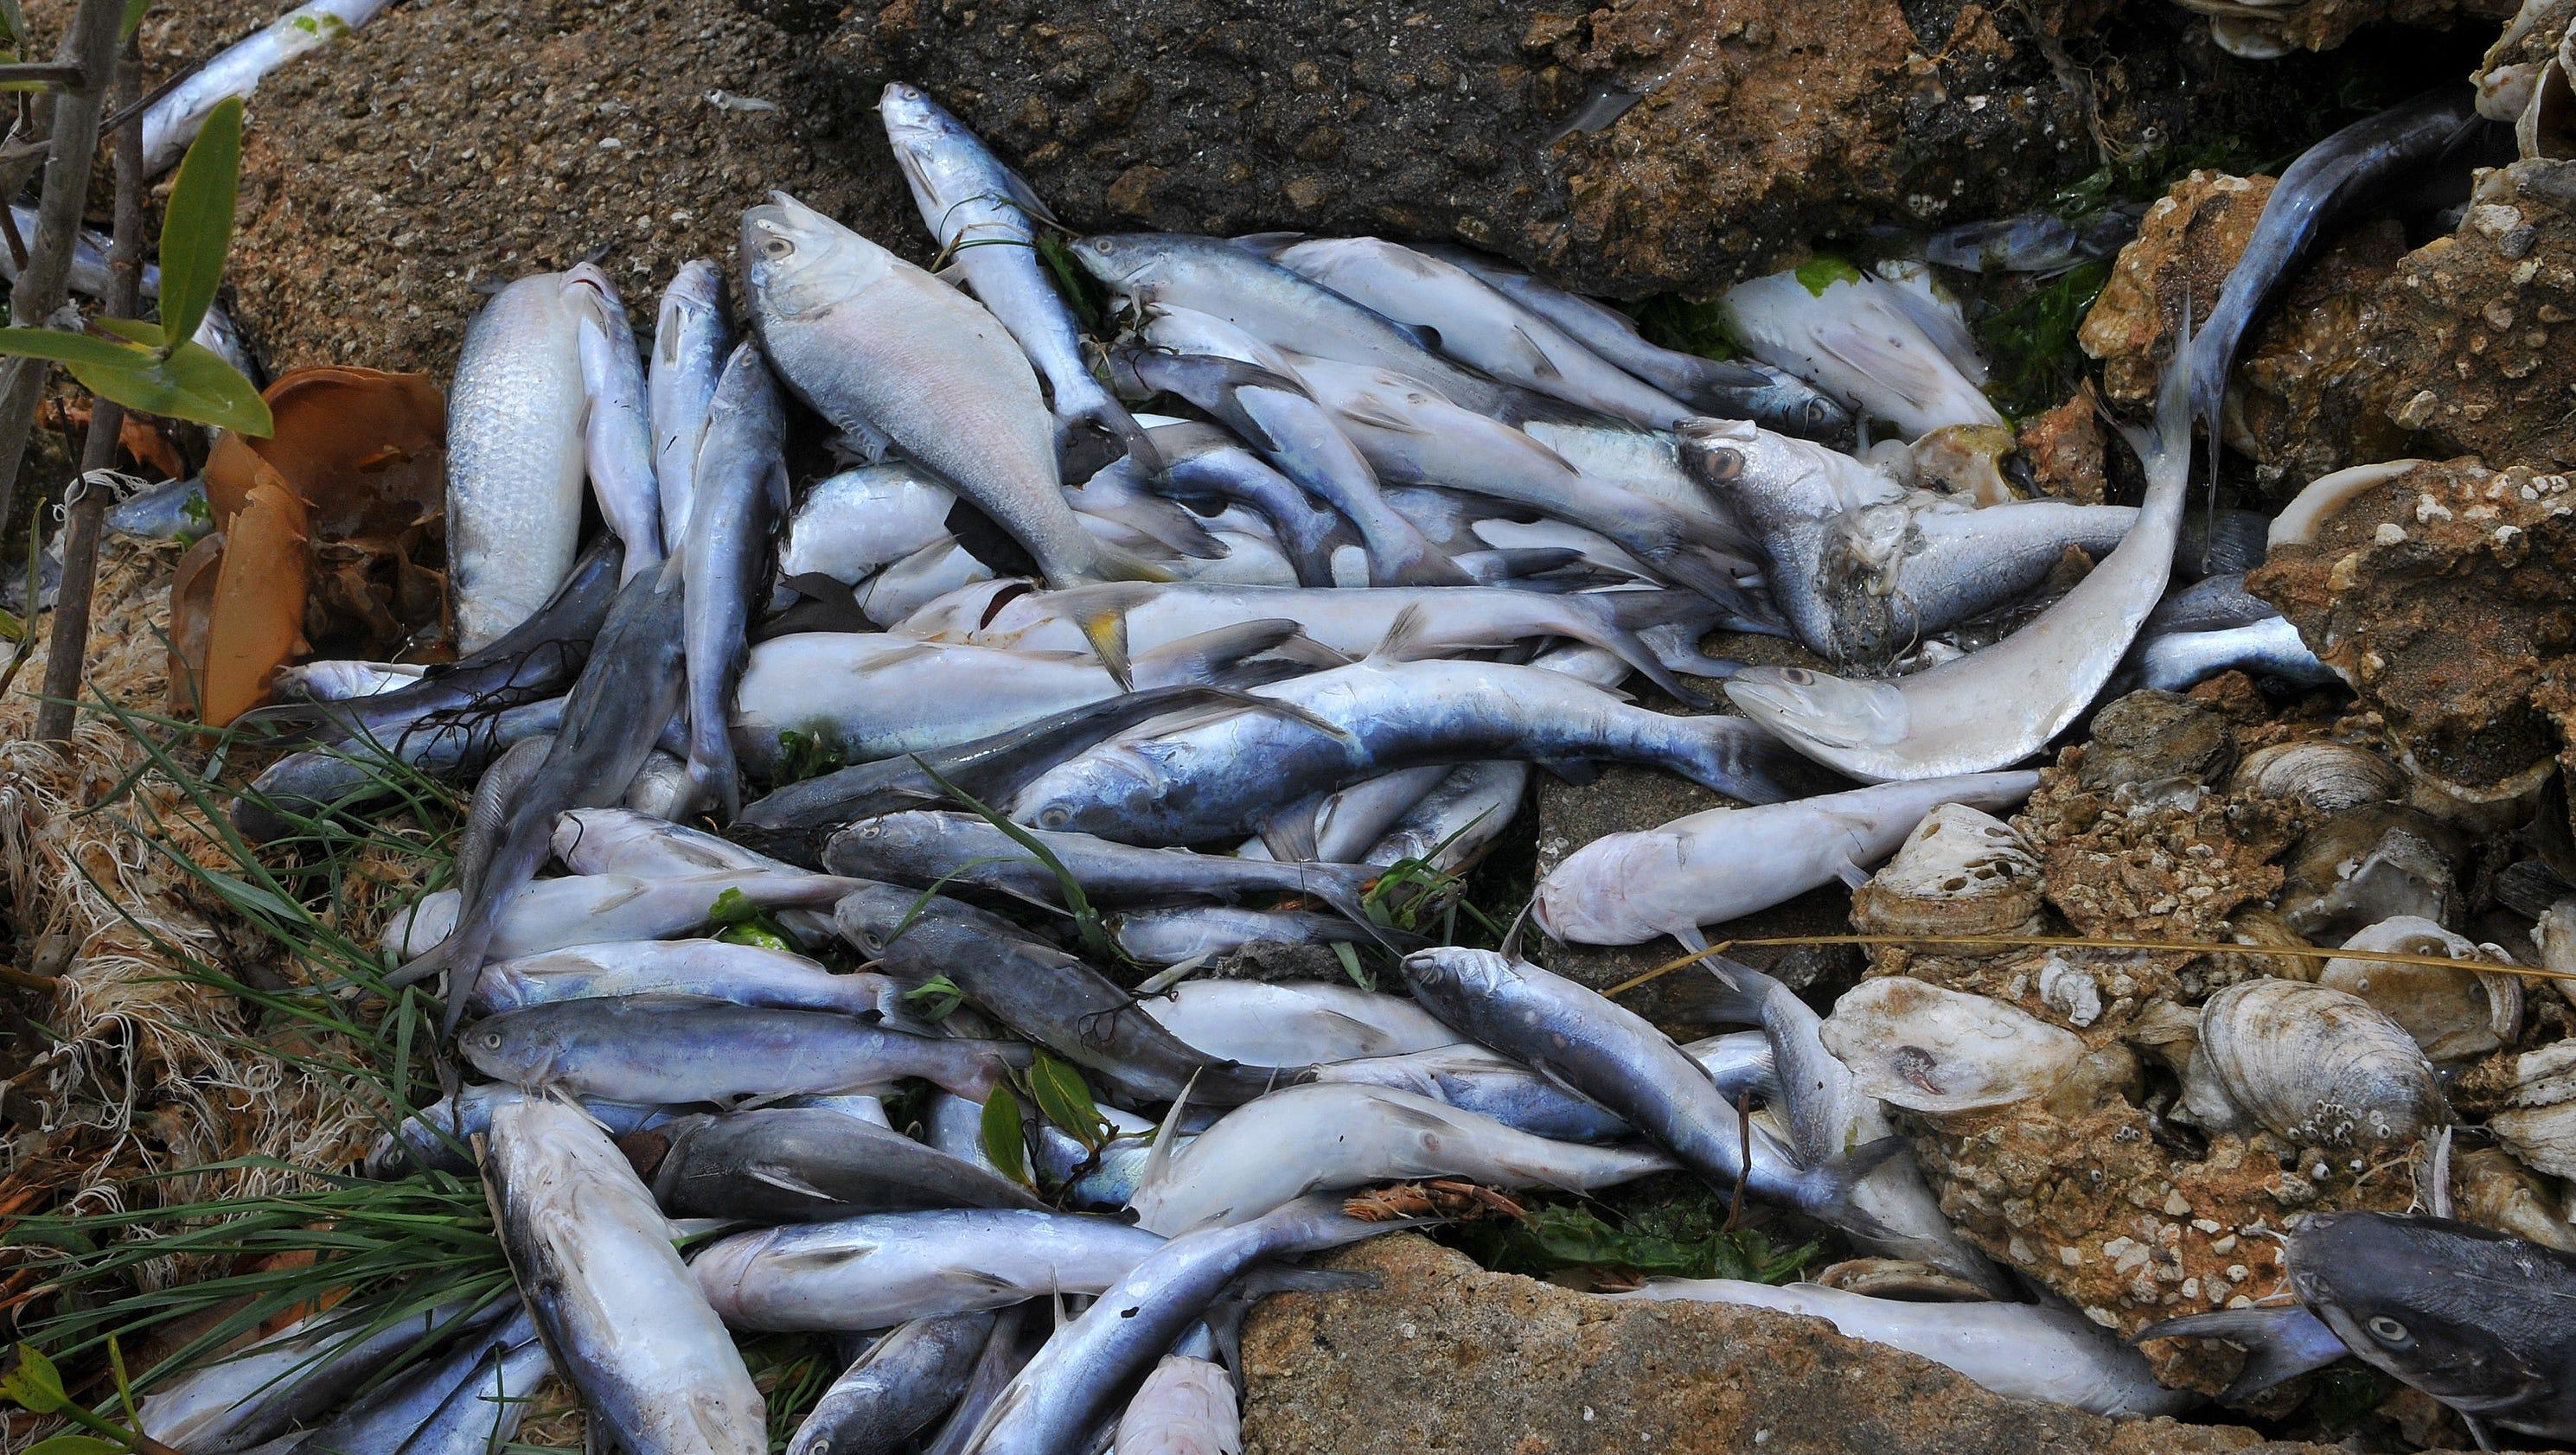 Fish kill banana river cocoa beach for Banana river fishing